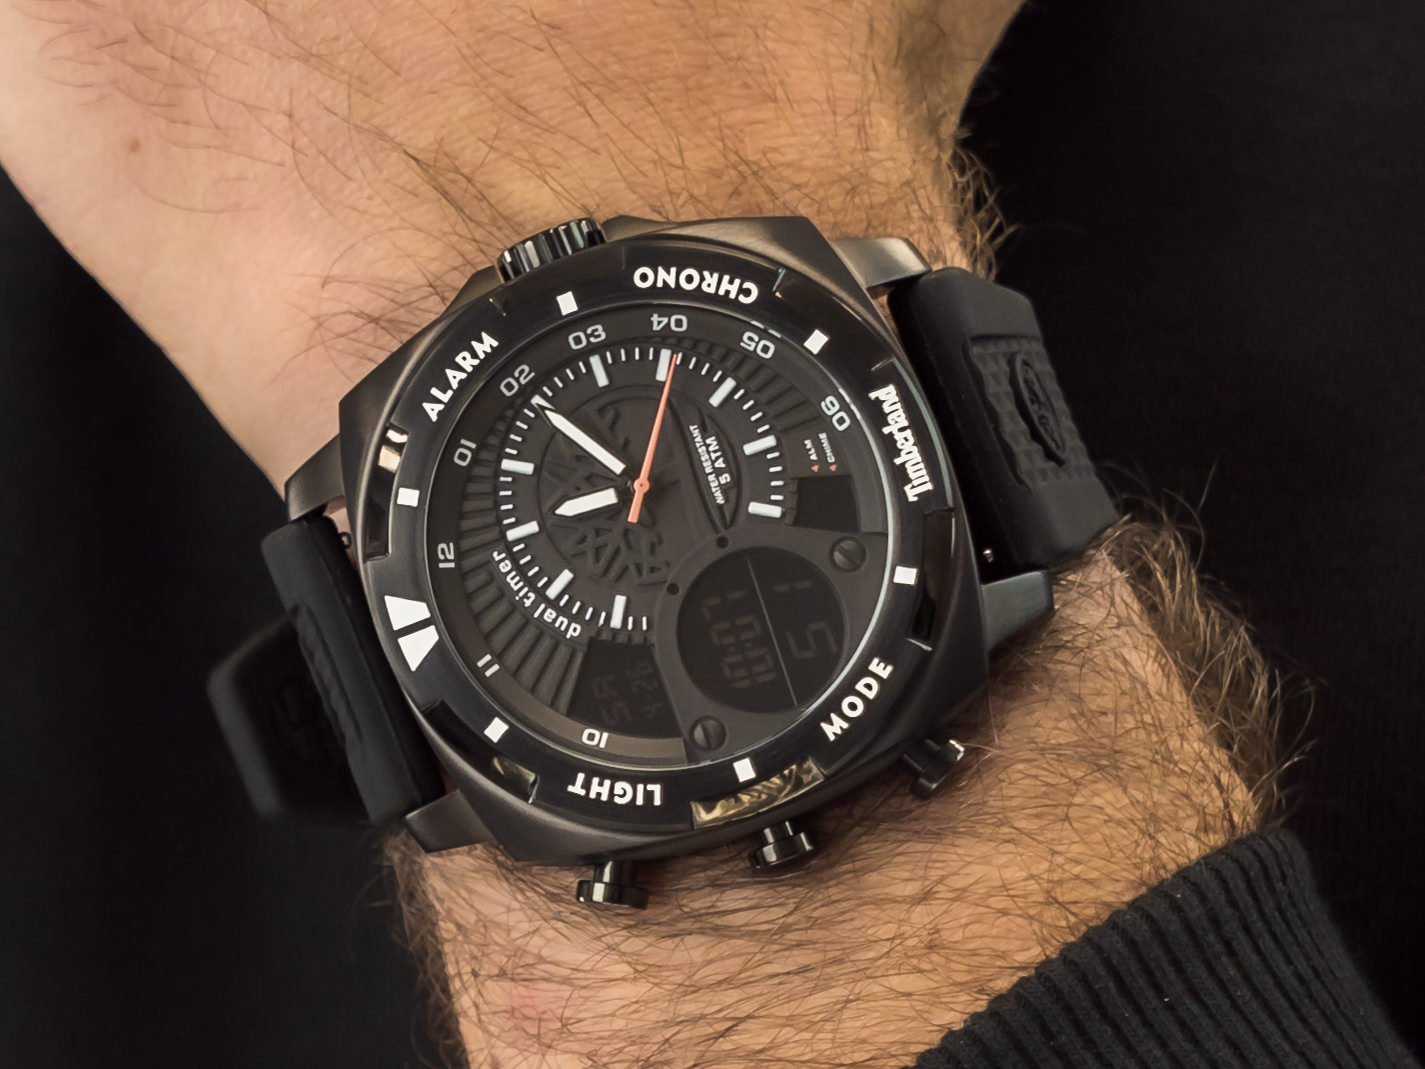 Timberland TBL.15517JSB-02P HINSDALE zegarek sportowy Hinsdale